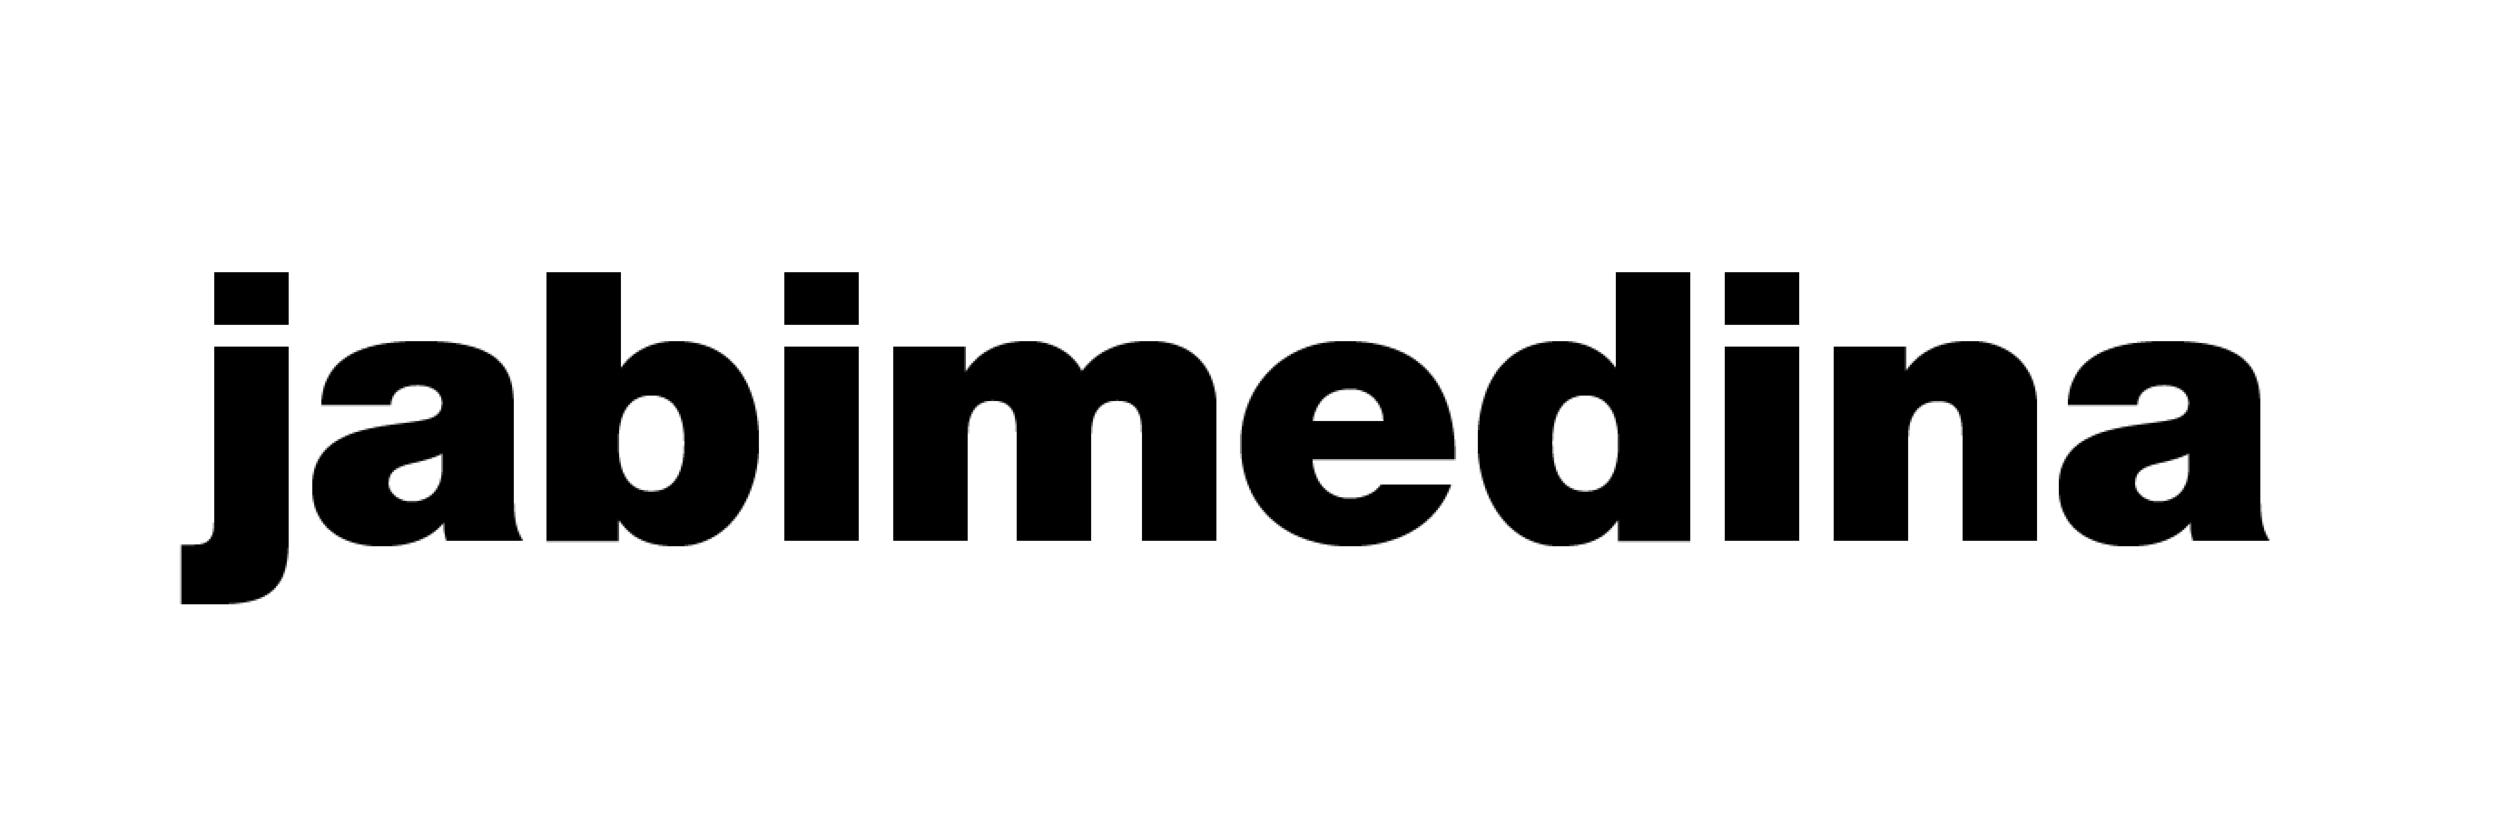 Como siempre, Helvetica Neue LT Std 95 black